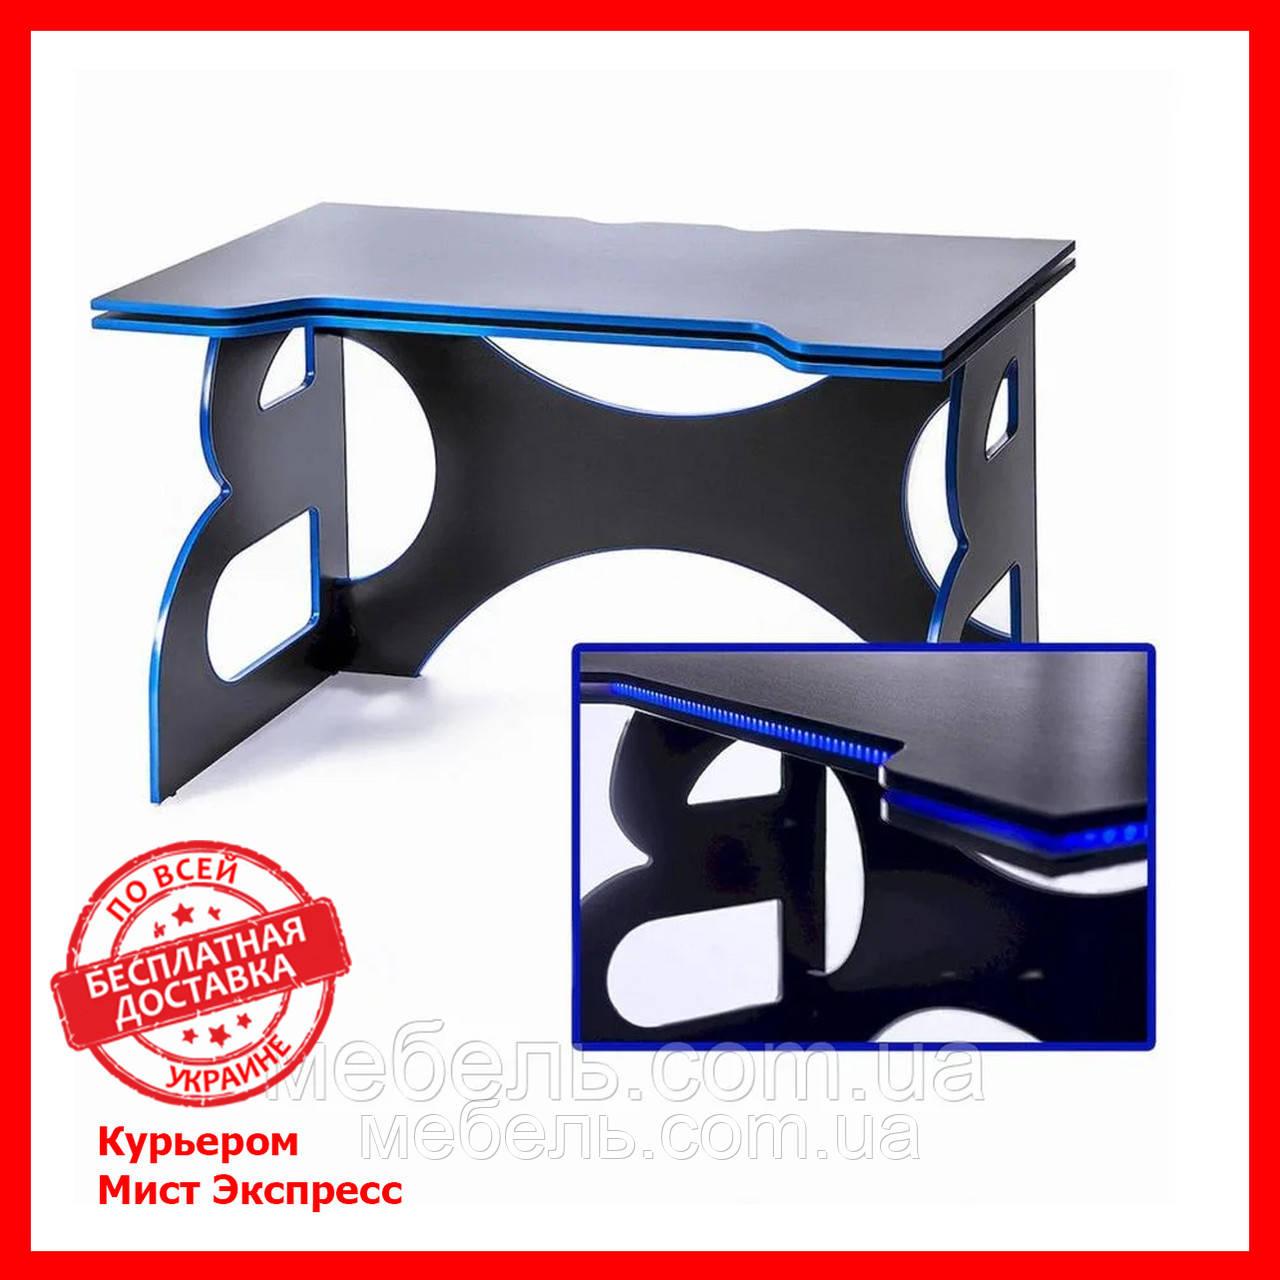 Компьютерный геймерский стол Barsky Homework Game Blue HG-04 с полкой HG-04 LED /ПК-01 1400*700